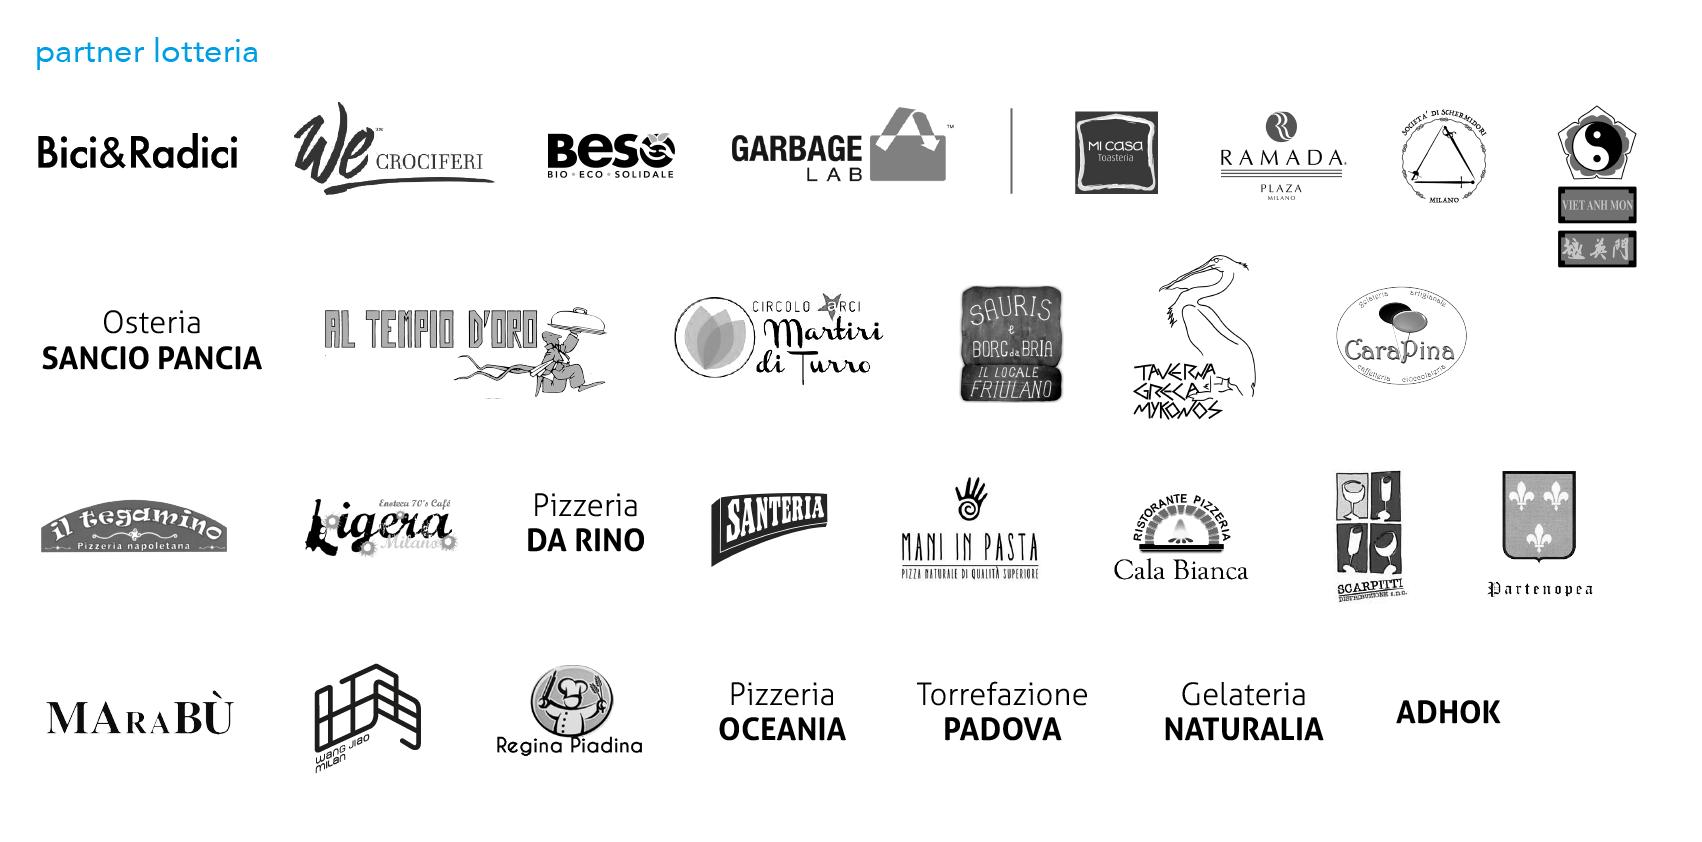 partners-lotteria-2015